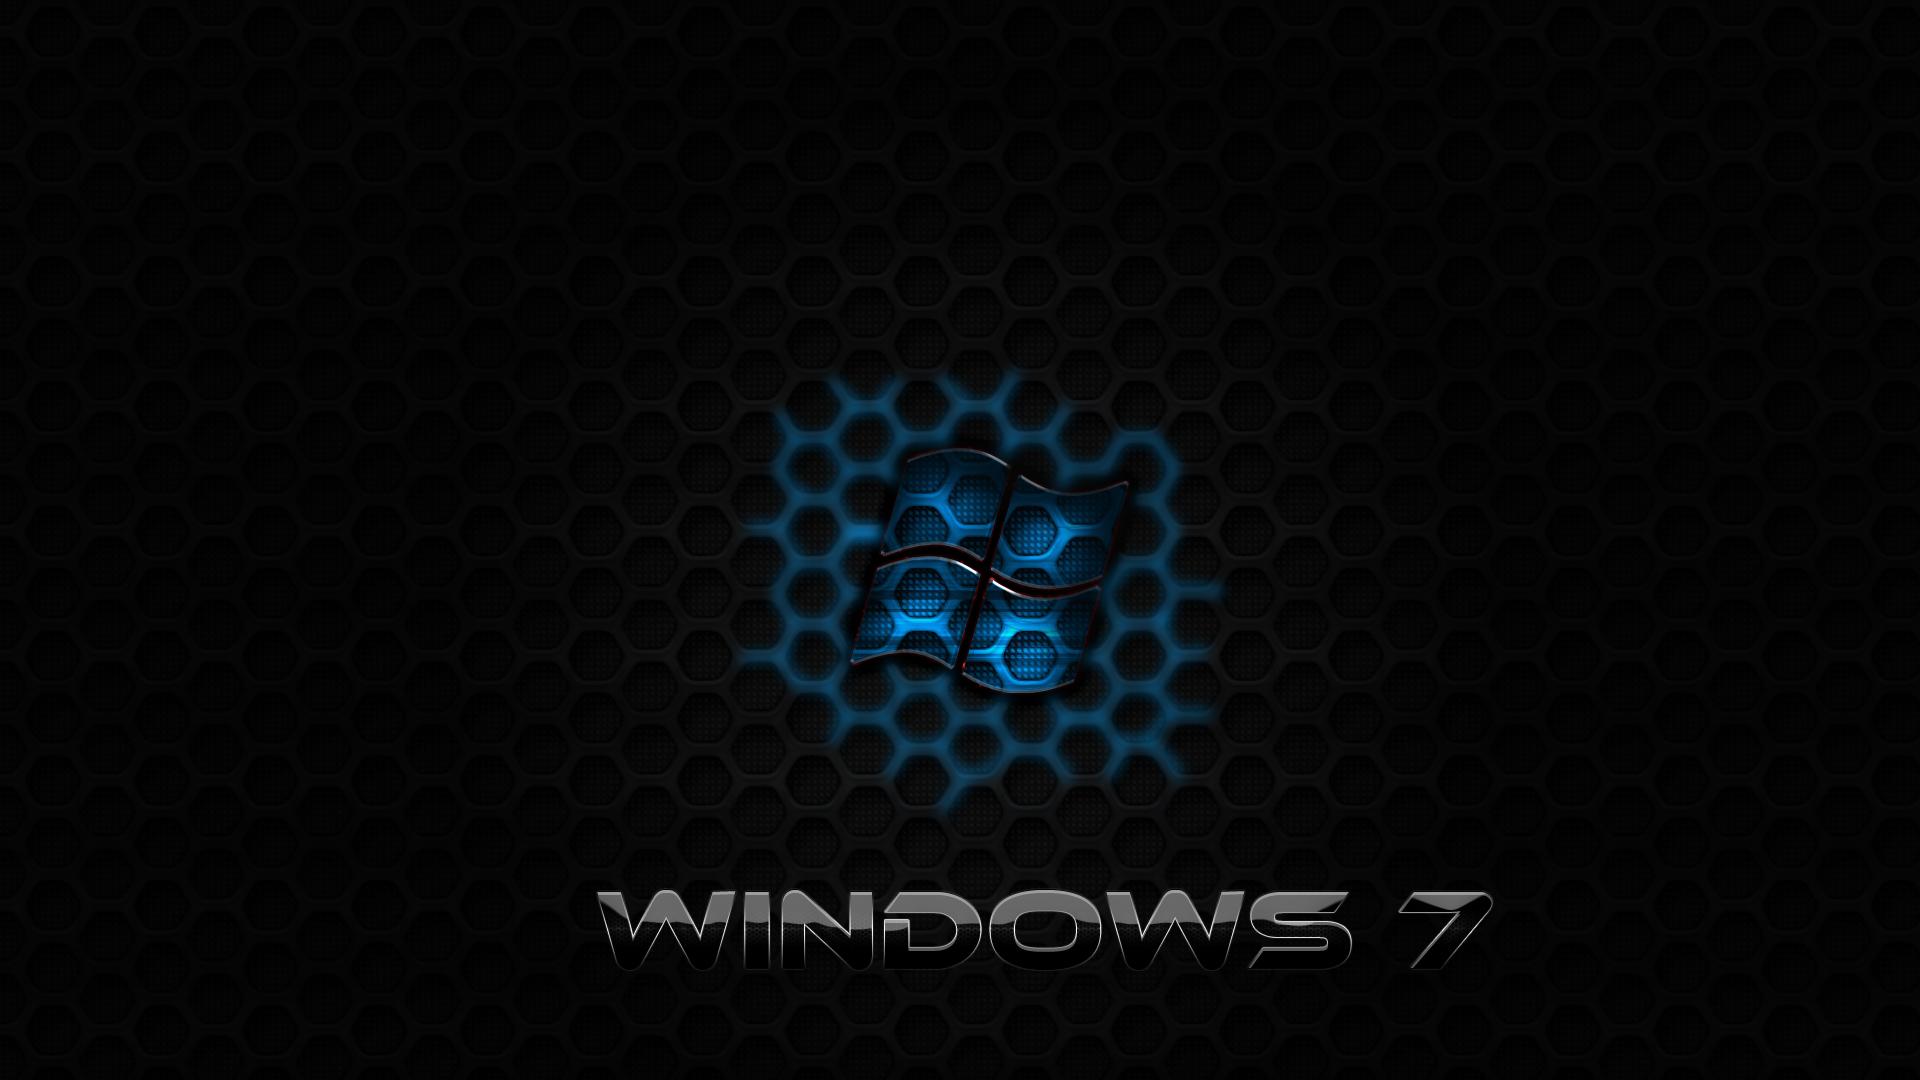 windows 7 blue glass by bluexr